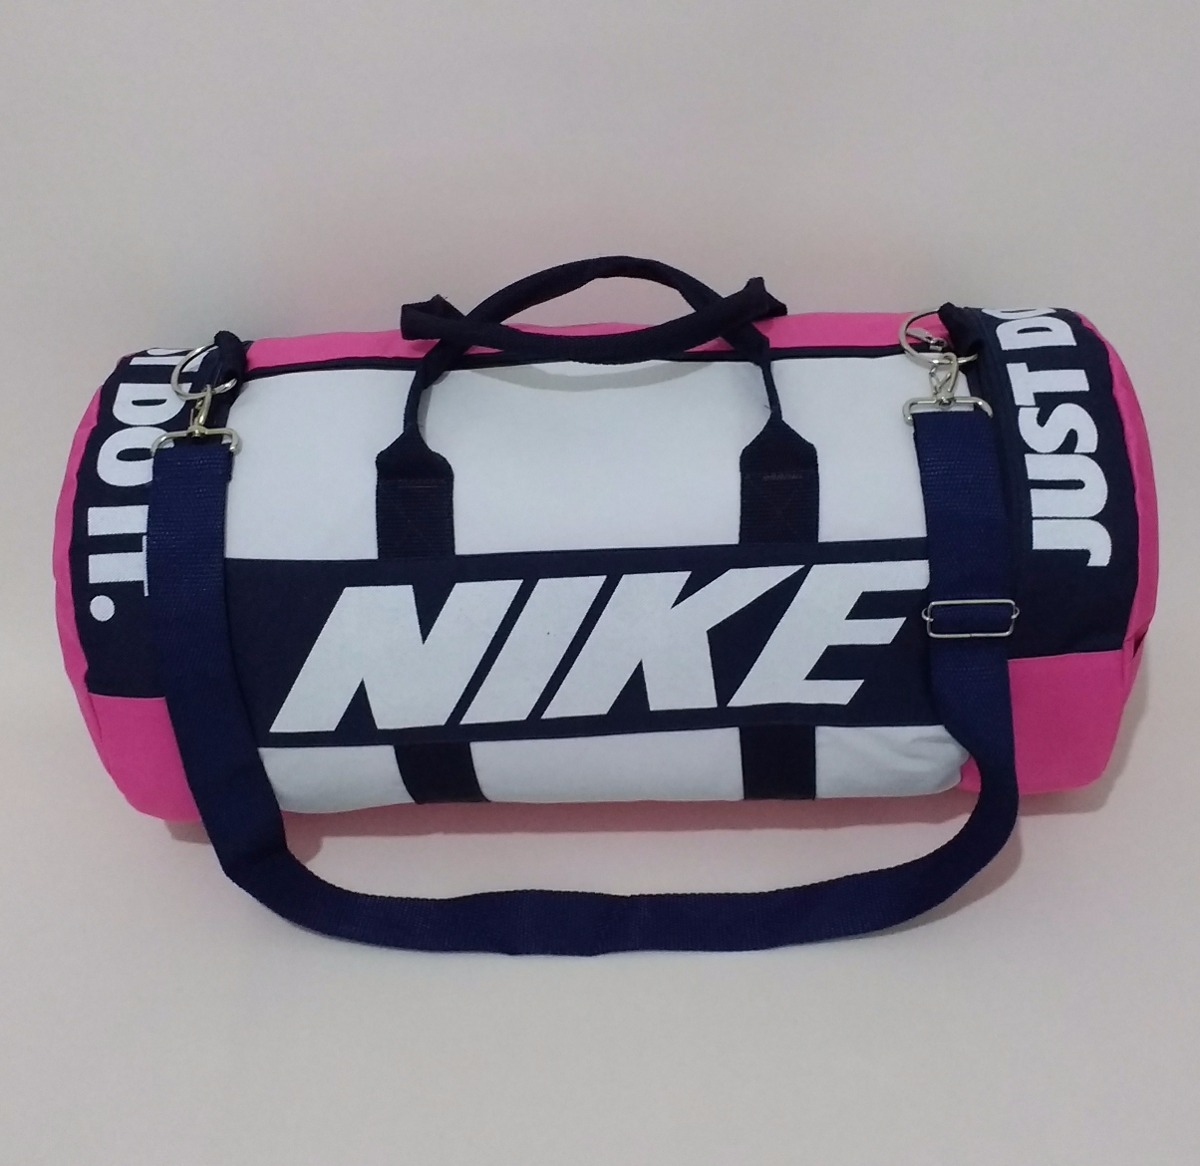 Mochila Nike Mala R57 Moda Academia Viagem Camping Grande Bolsa kX8nP0wO